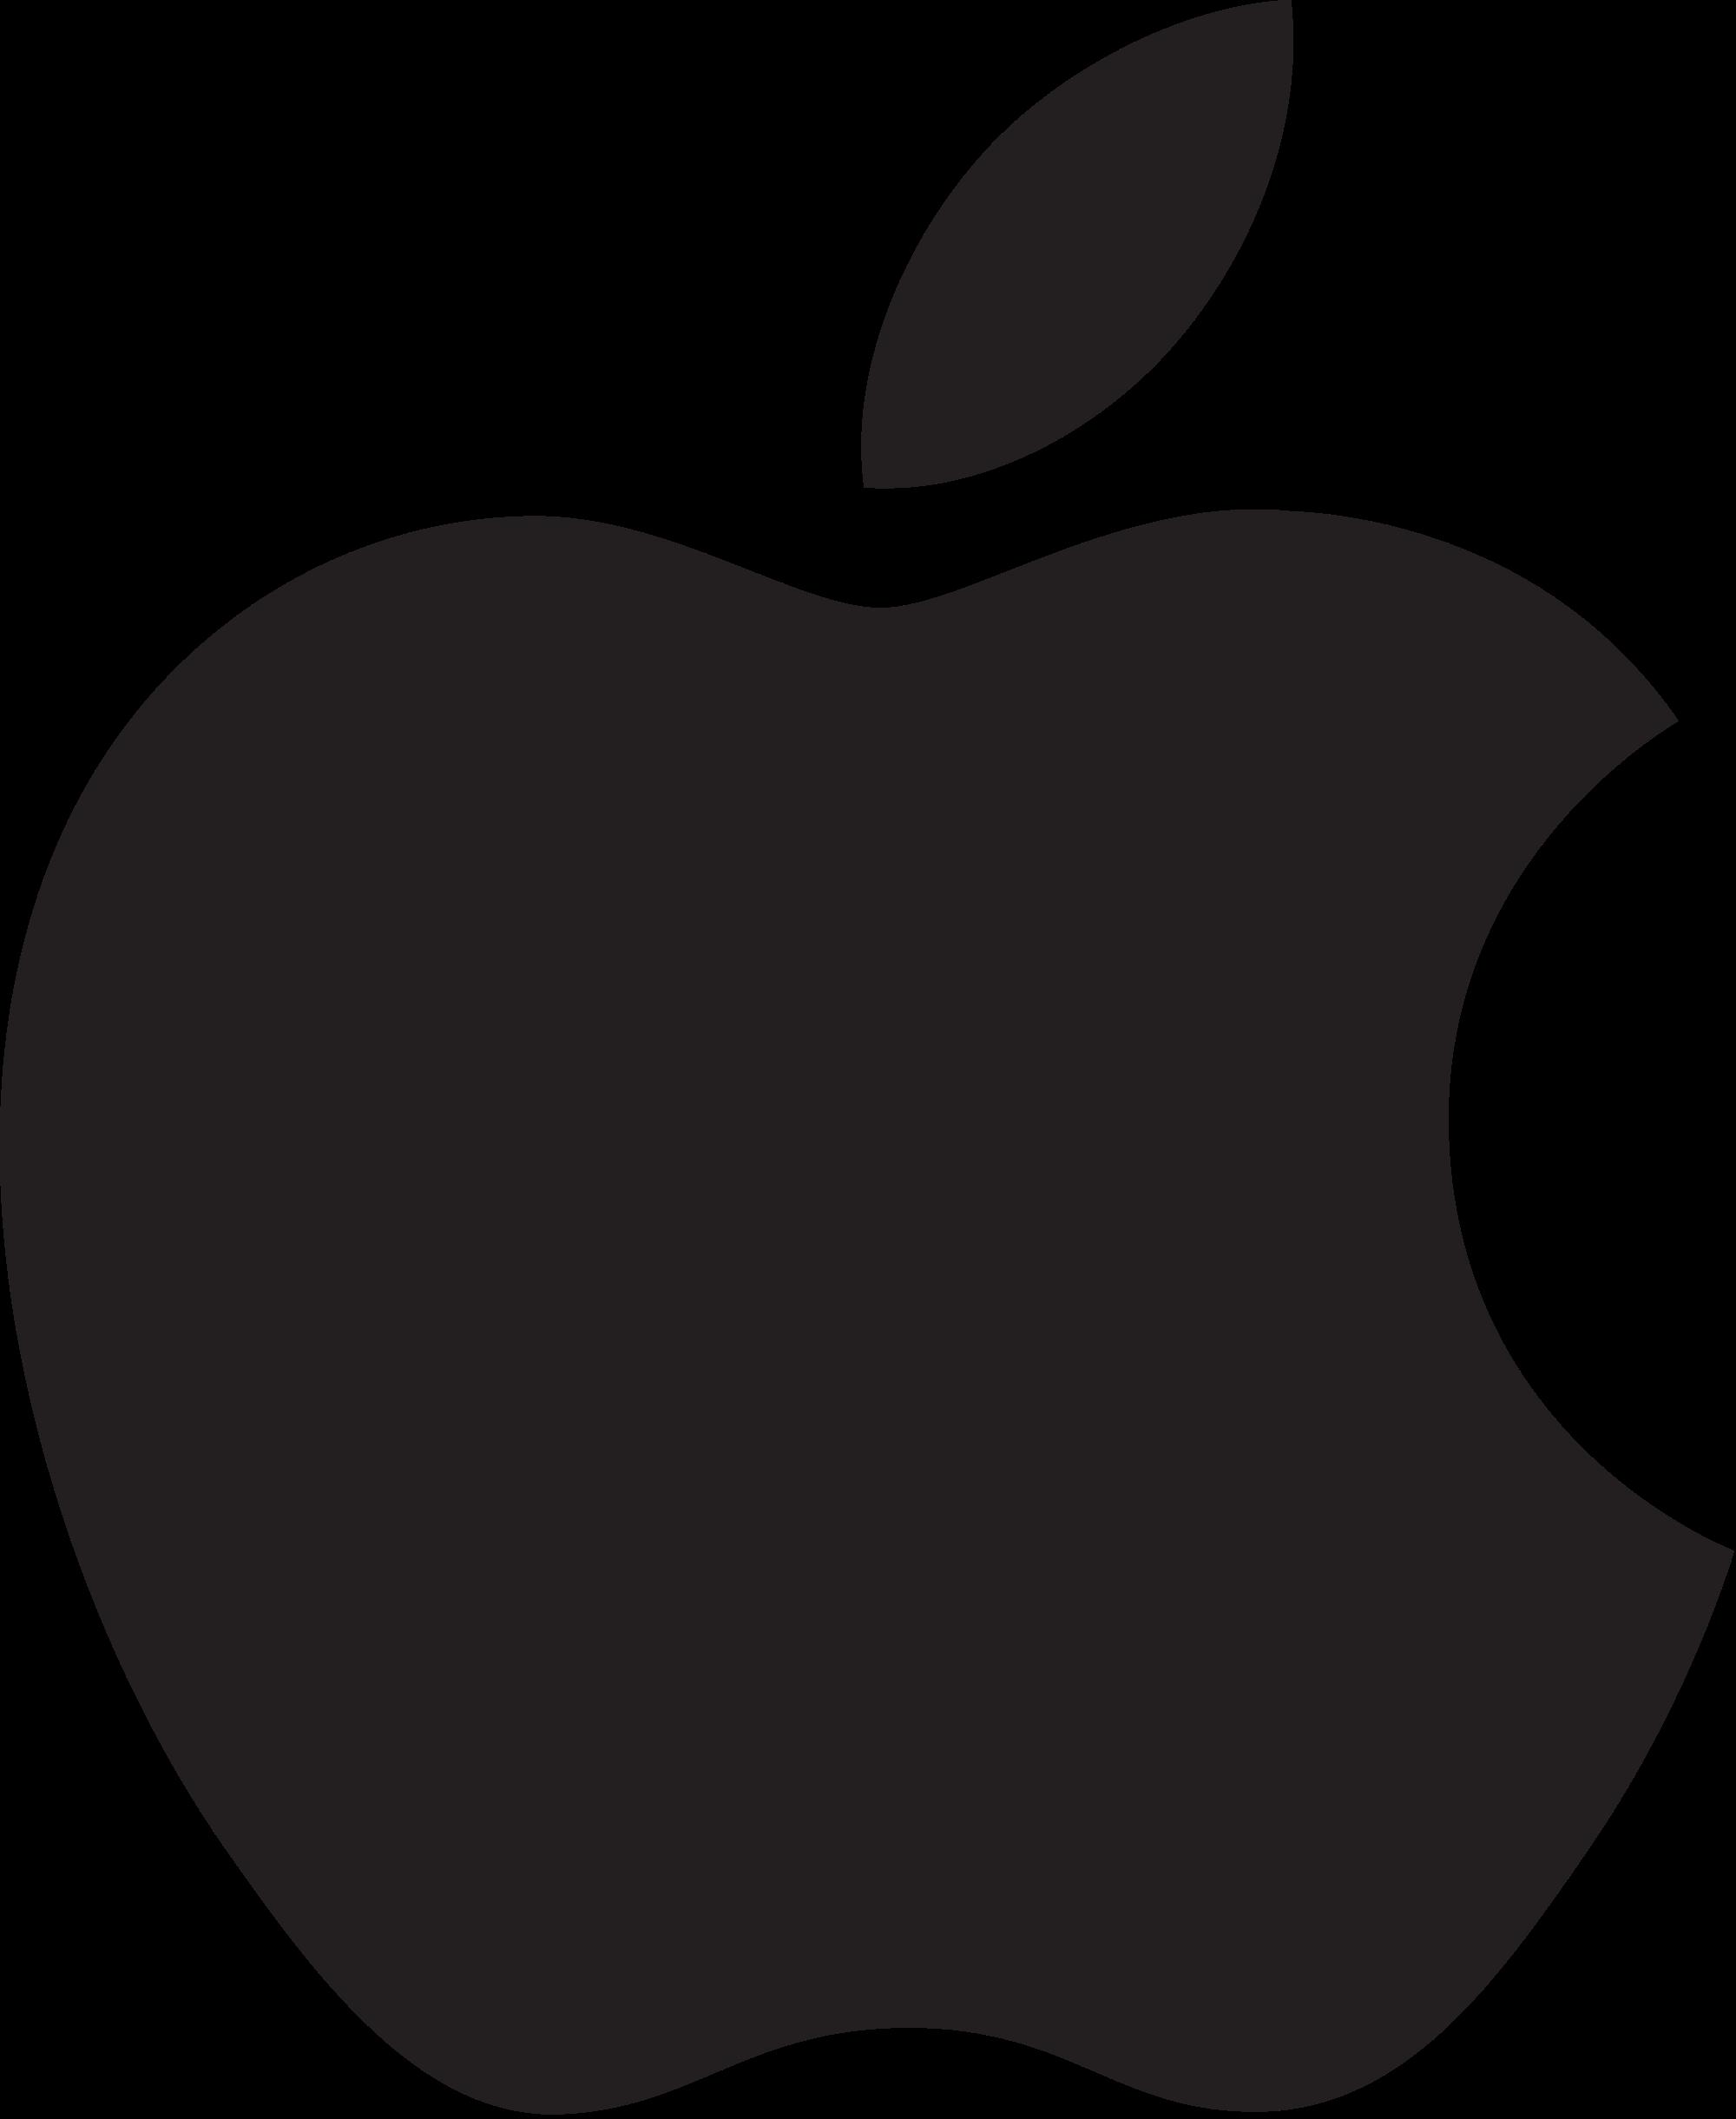 Apple inc disney wiki fandom powered by wikia apple inc stopboris Image collections